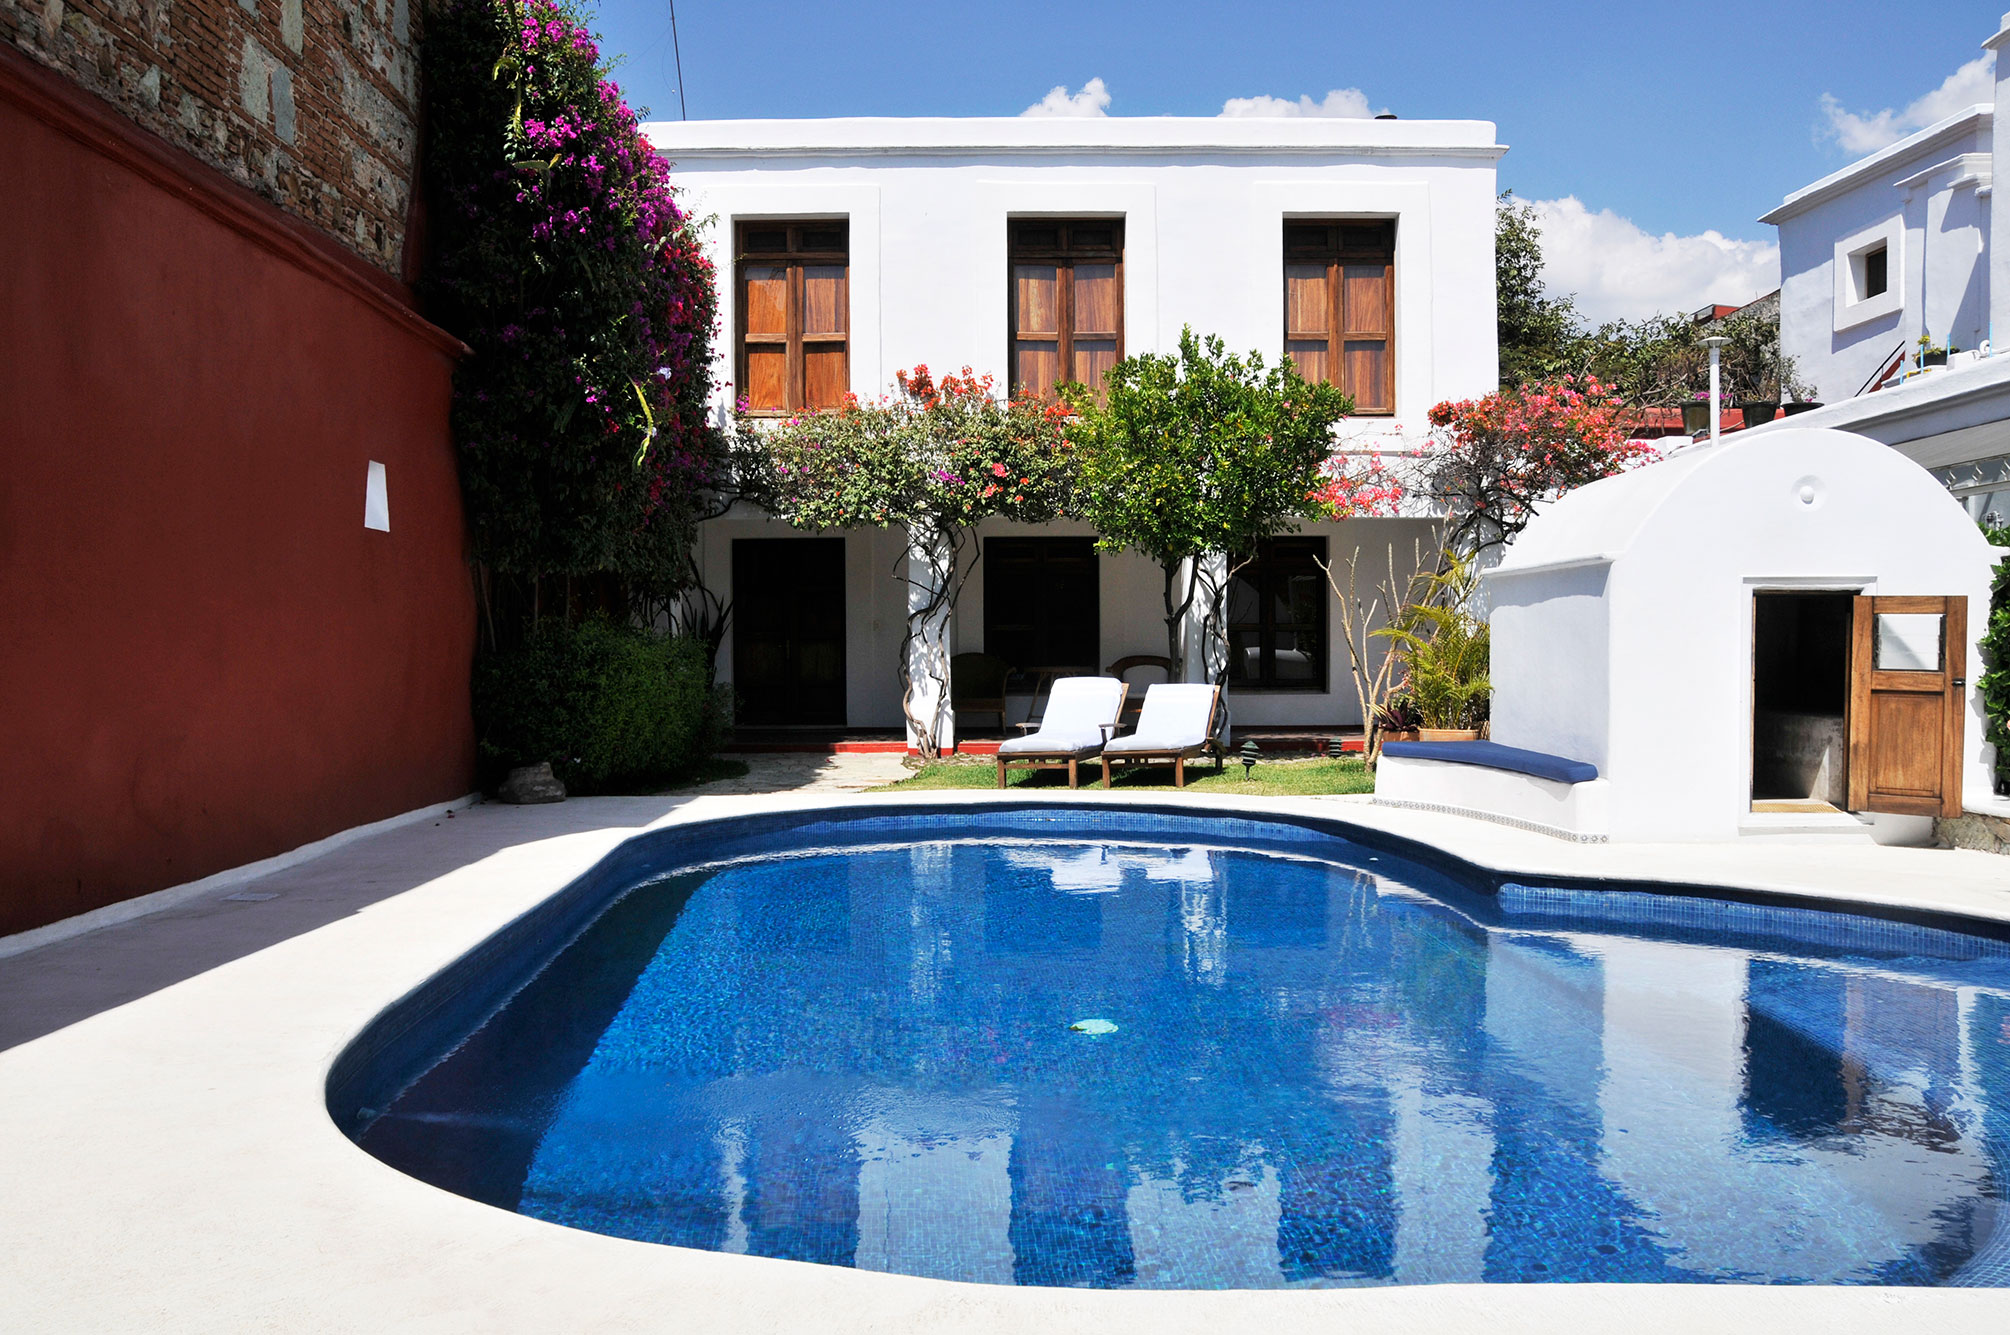 Hospedaje en Oaxaca donde hospedarse hoteles